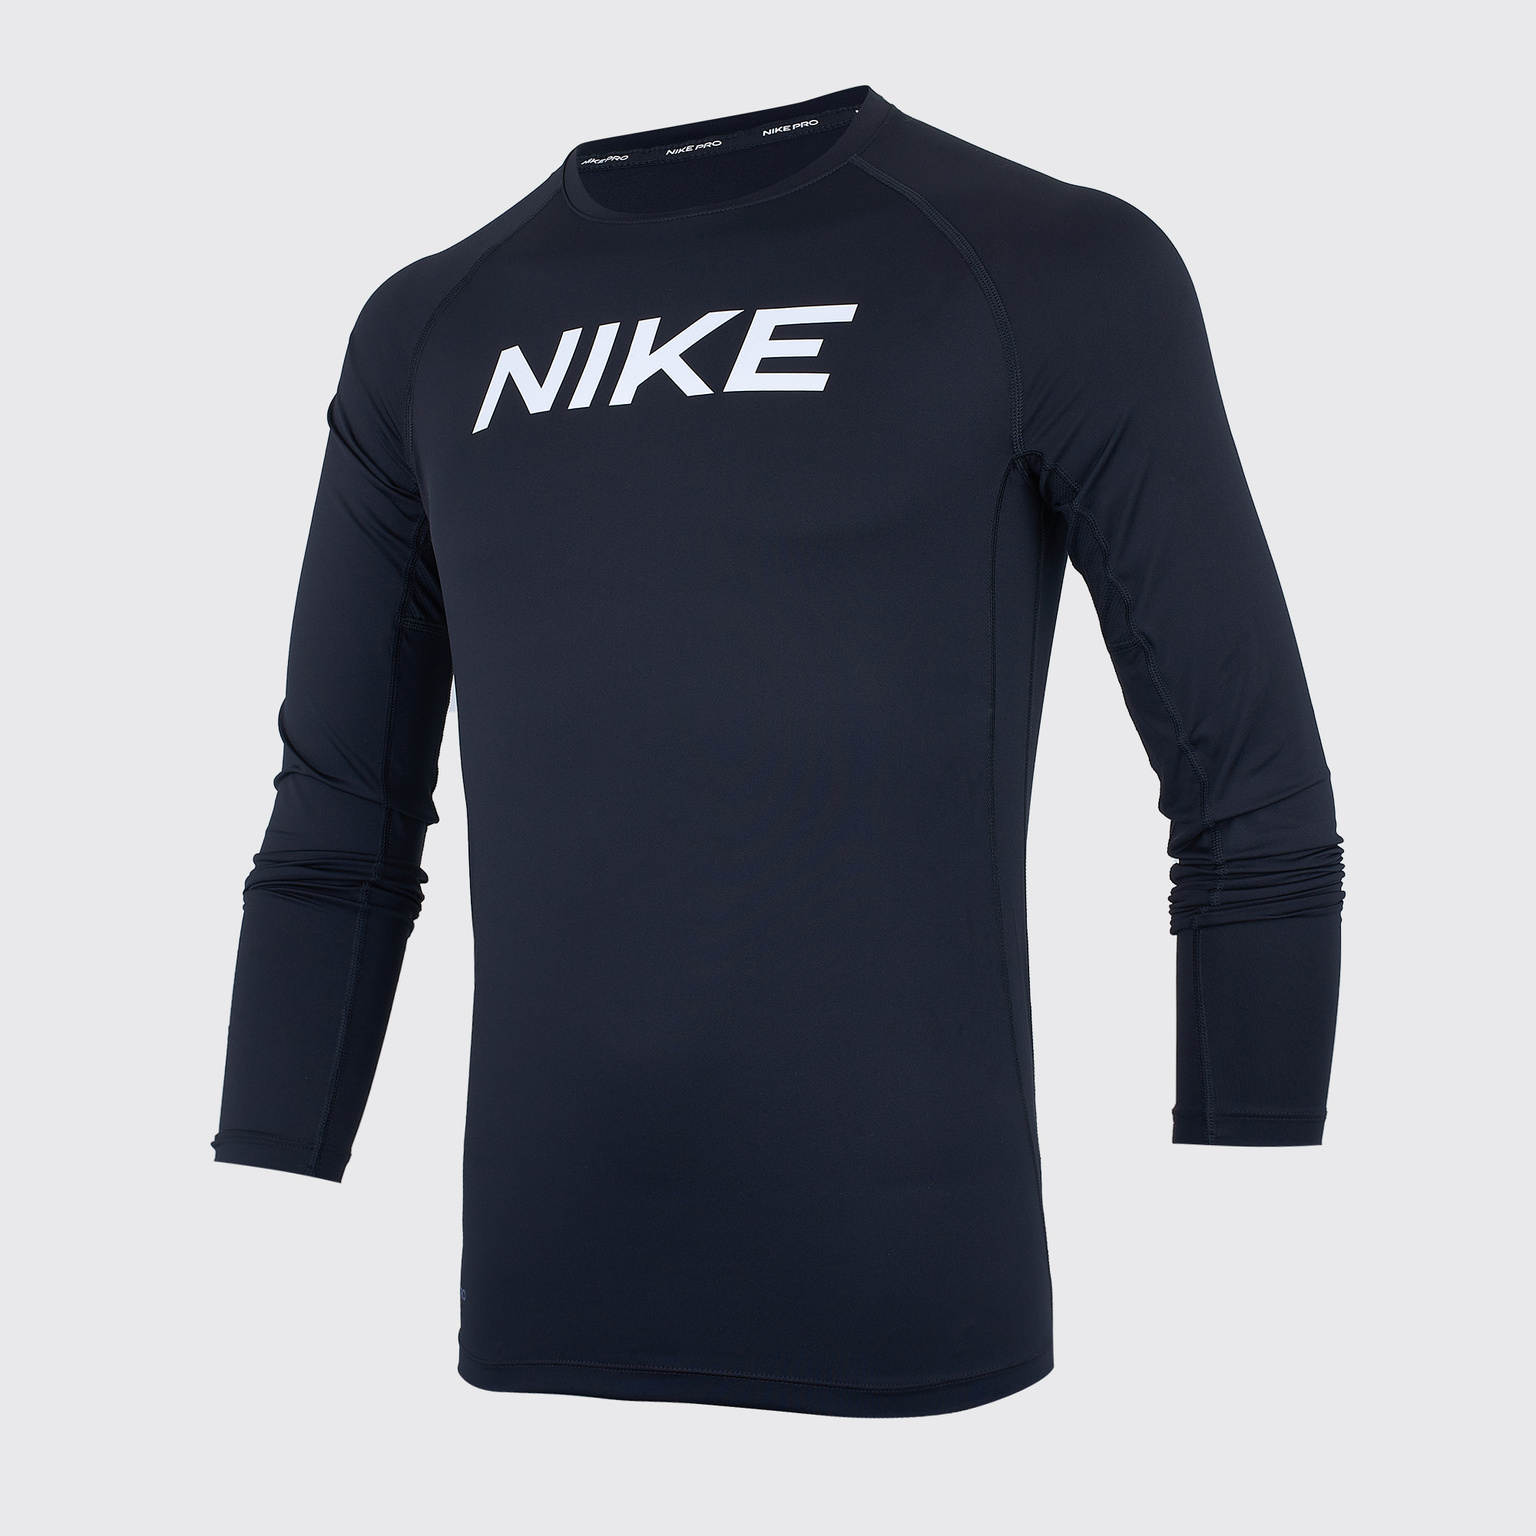 цена Белье футболка подростковая Nike Training Top CJ7711-010 онлайн в 2017 году